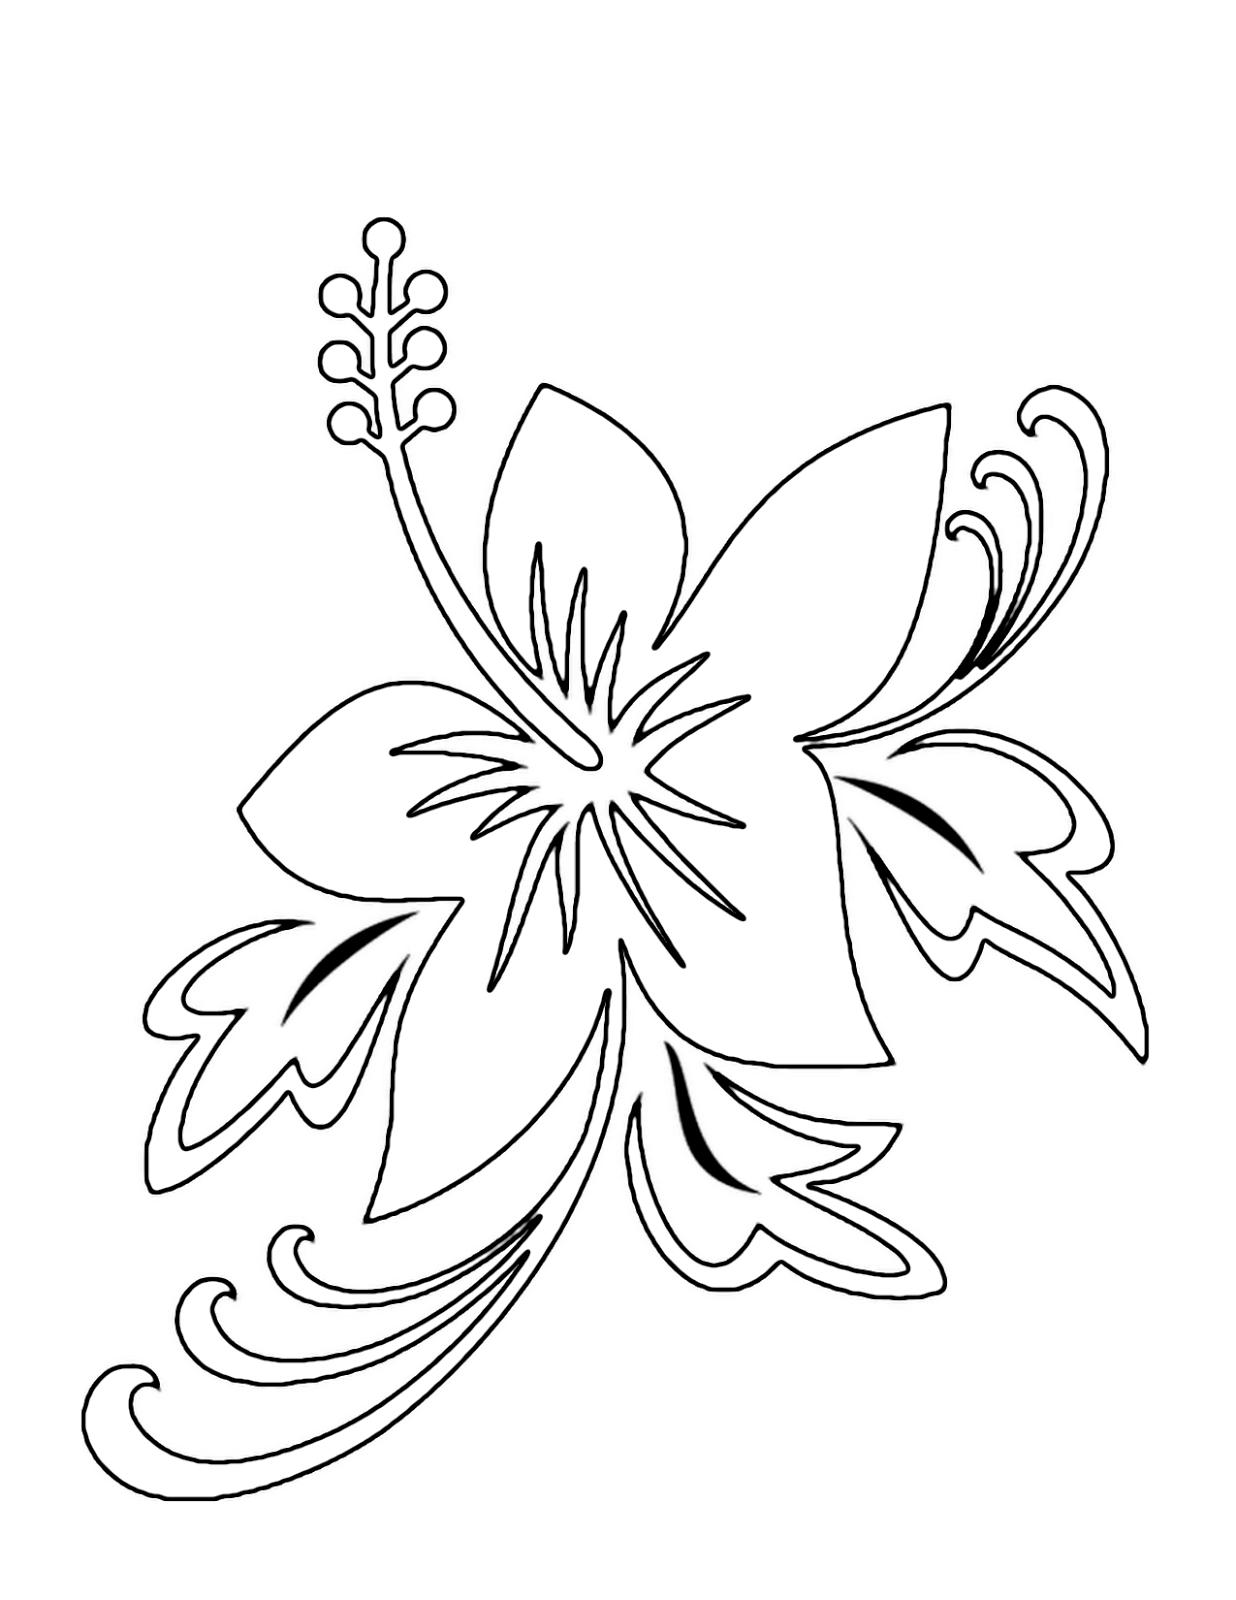 Ausmalbilder Blumen Blüten : Adult Coloring Pages Flowers 15156 Bestofcoloring Com Coloring